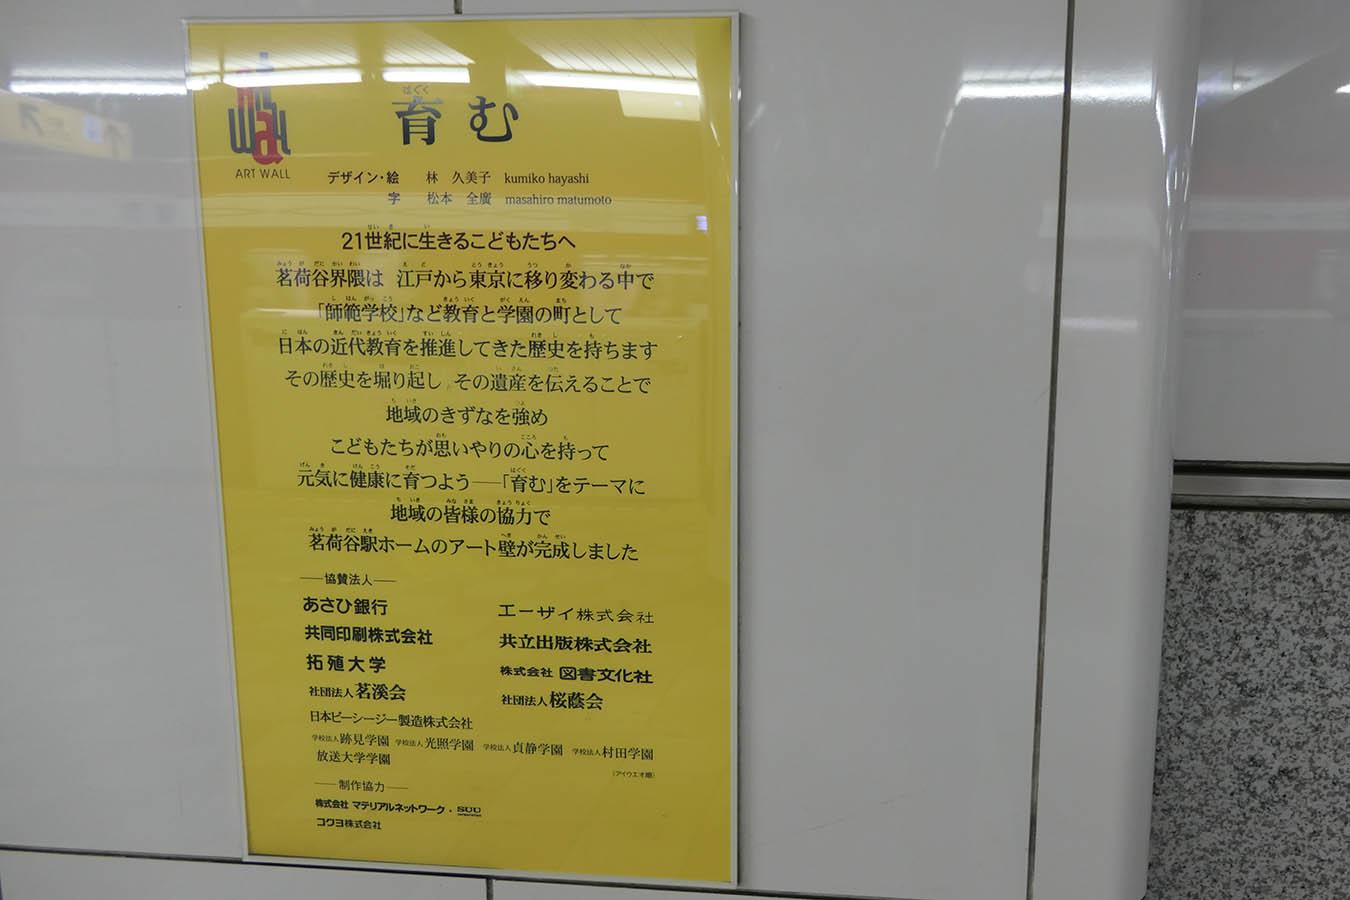 M23_photo08.jpg